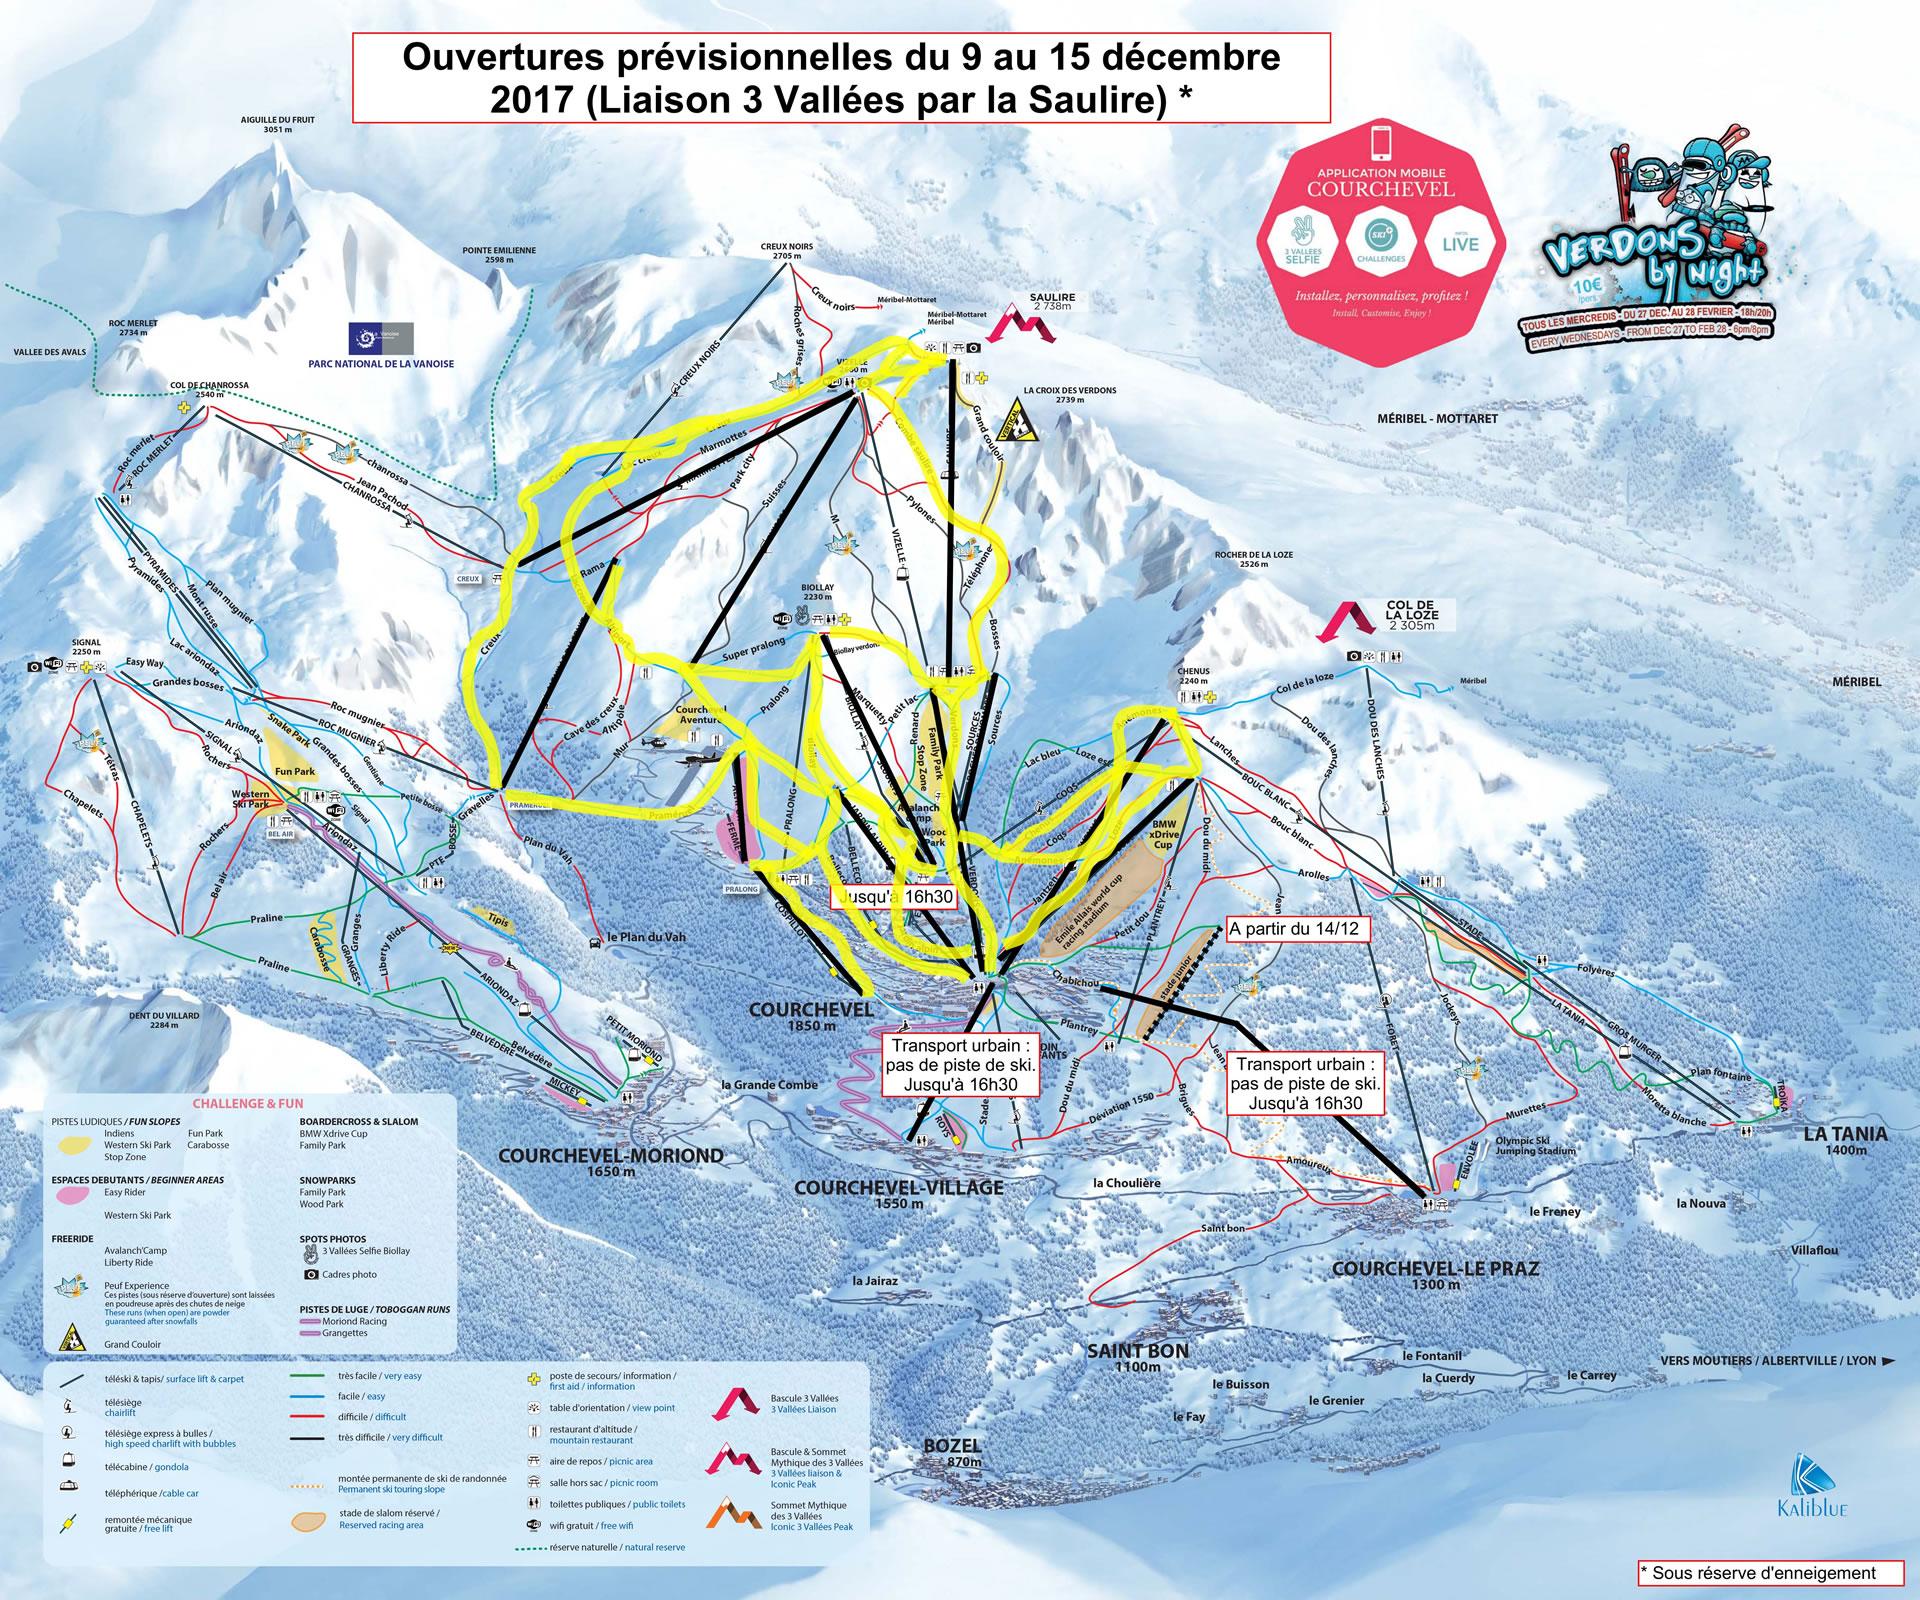 La Tania Ski Blog - Latest news, snow reports, ski information ...